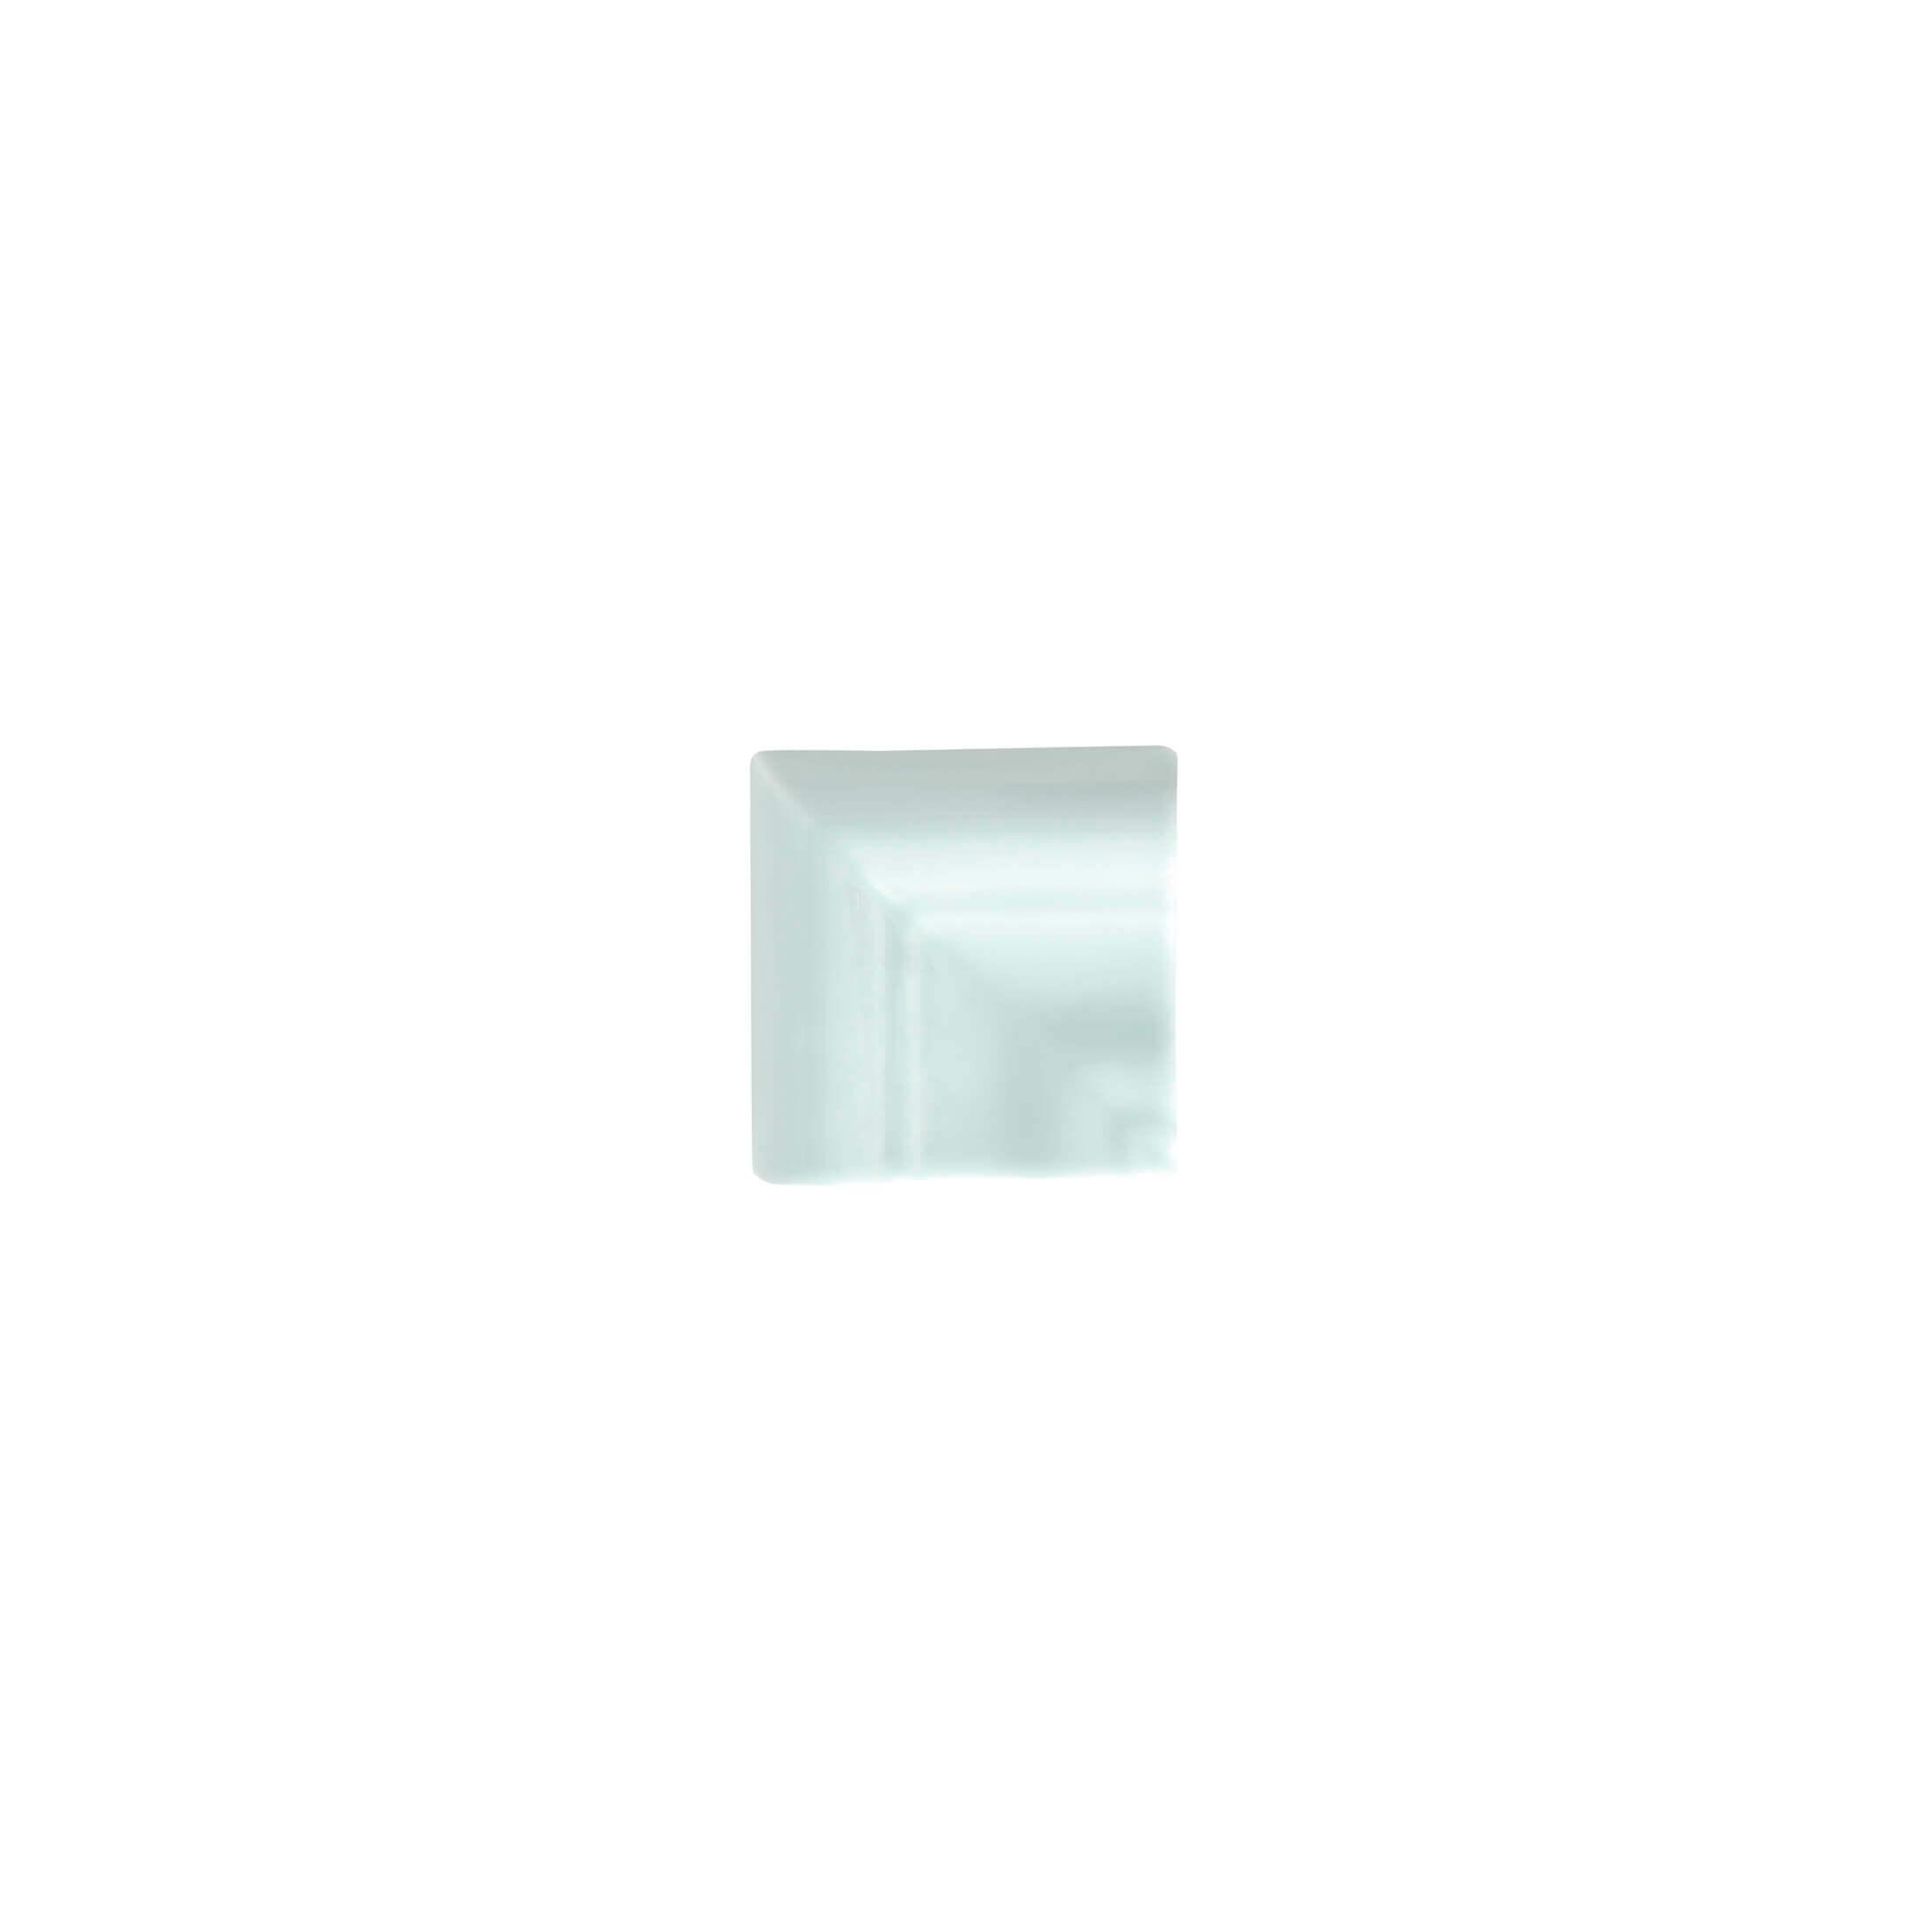 ADST5254 - ANGULO MARCO CORNISA - 7.5 cm X 19.8 cm